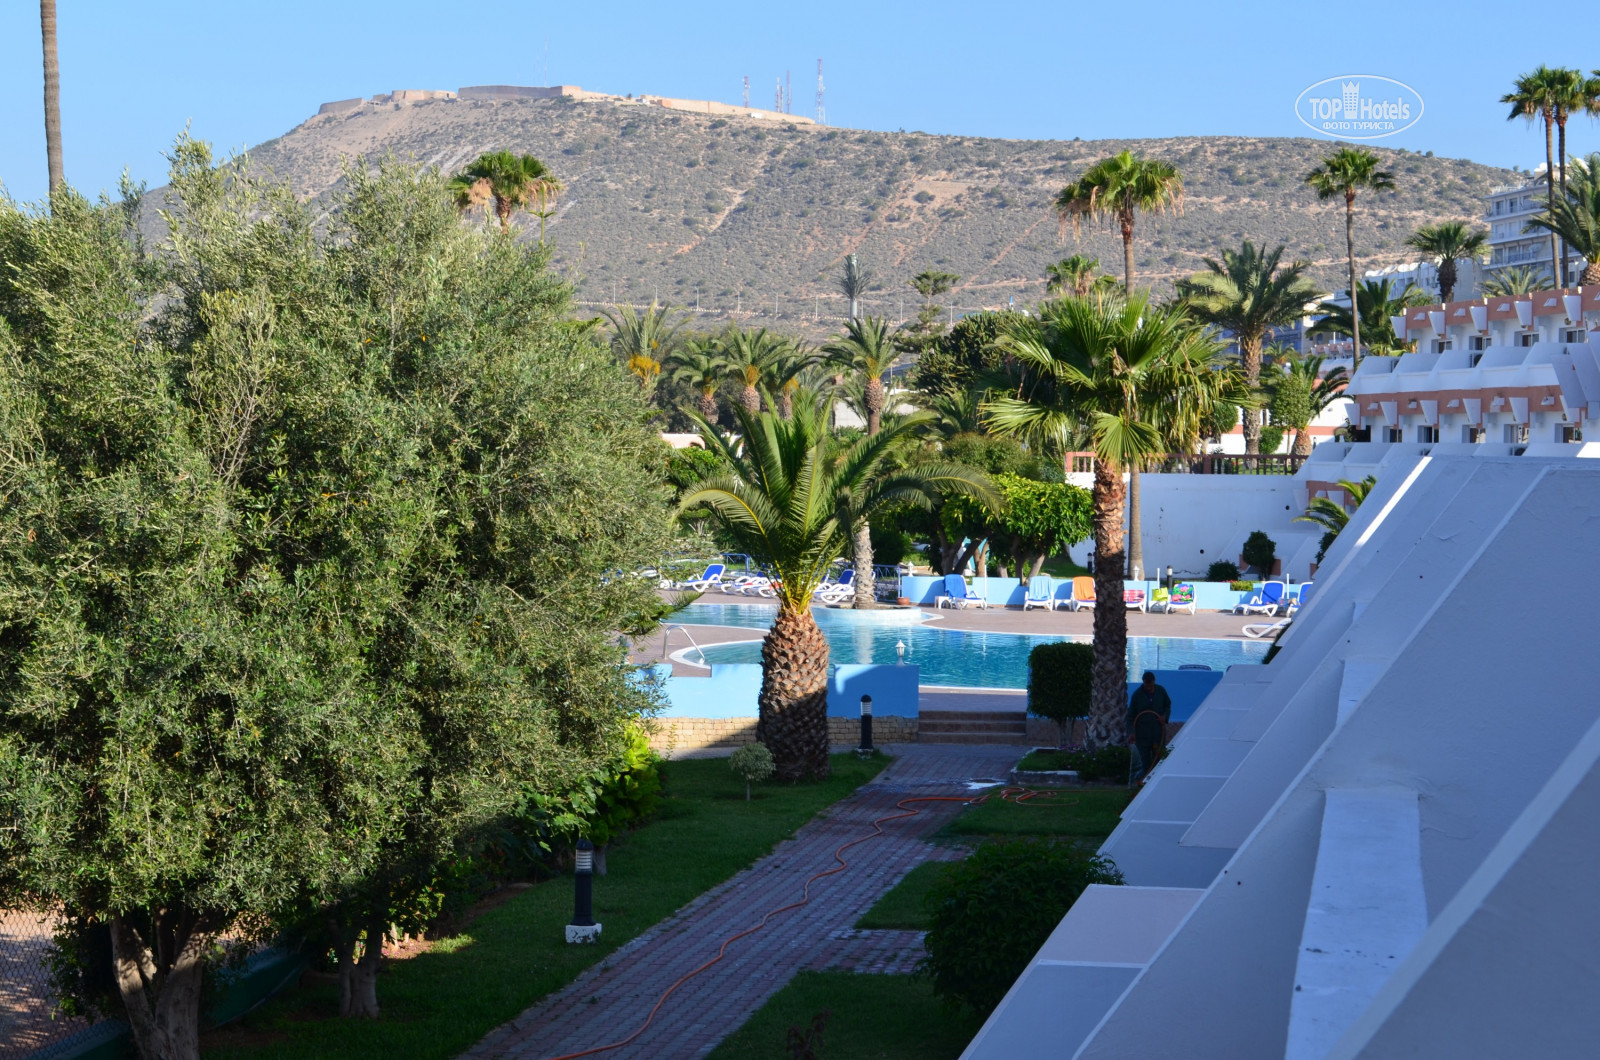 All photos: View from the room отеля Al Moggar Garden Beach Club 4 ...